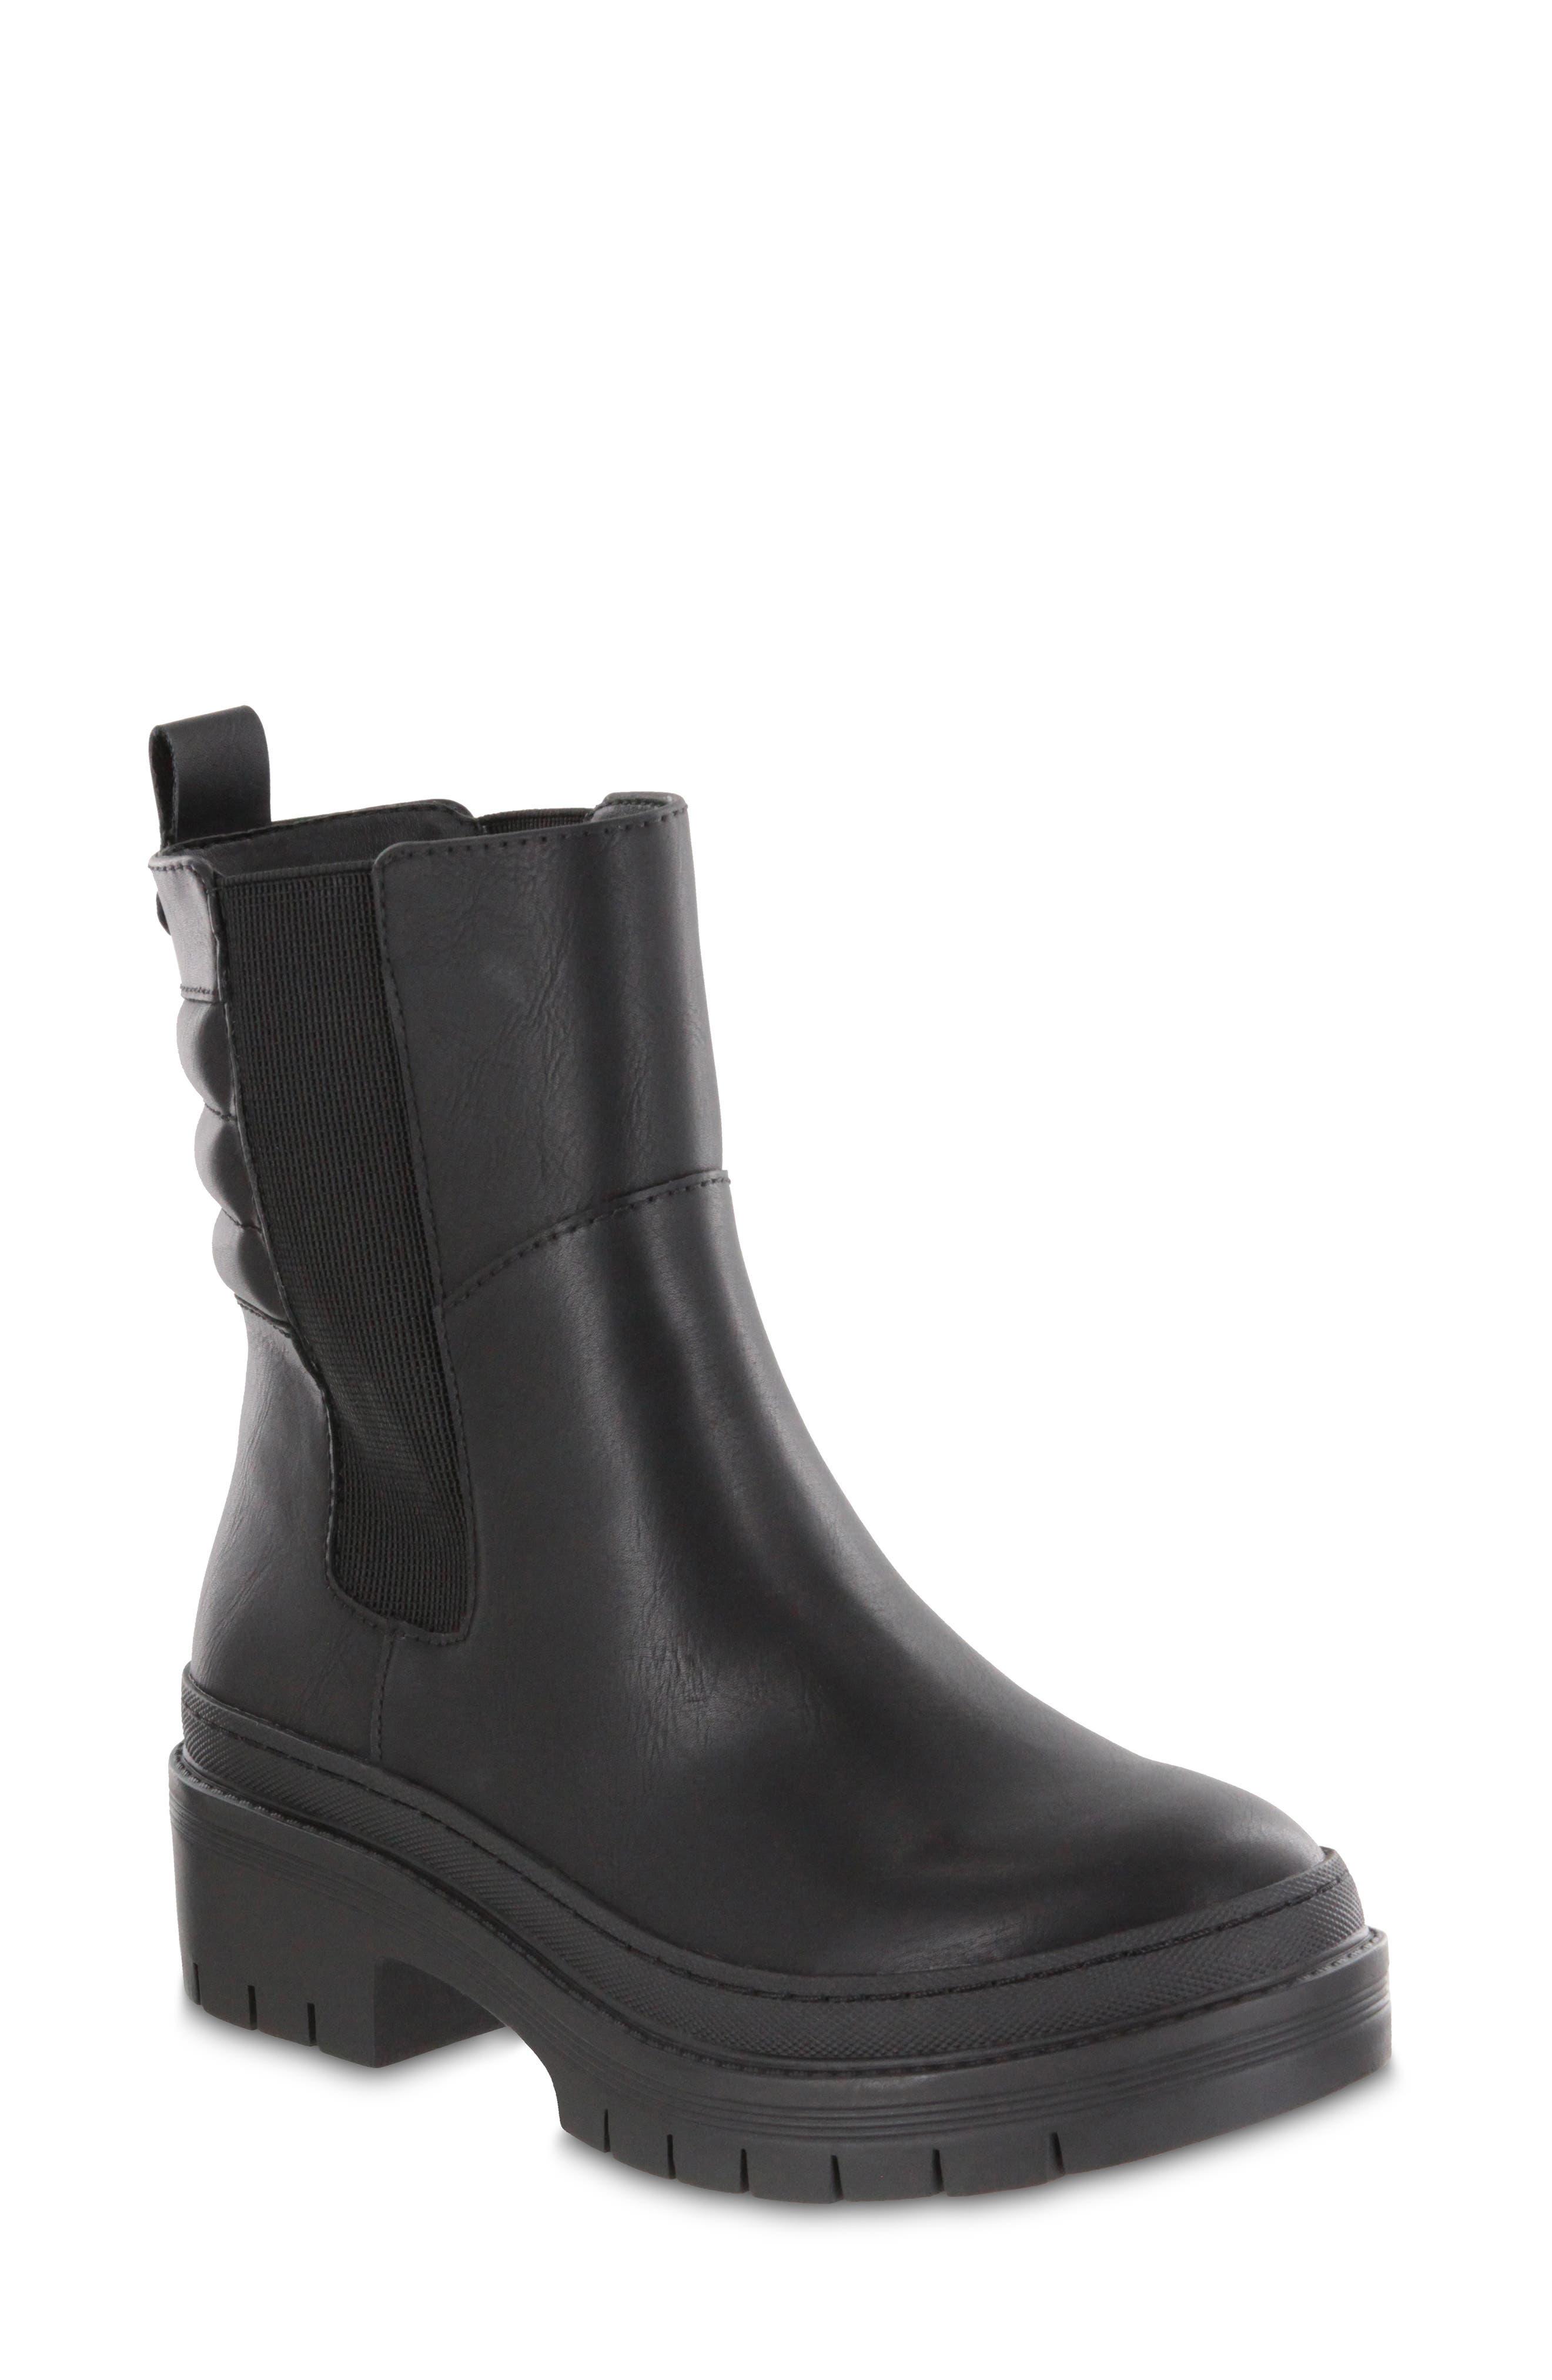 Jayme Chelsea Boot